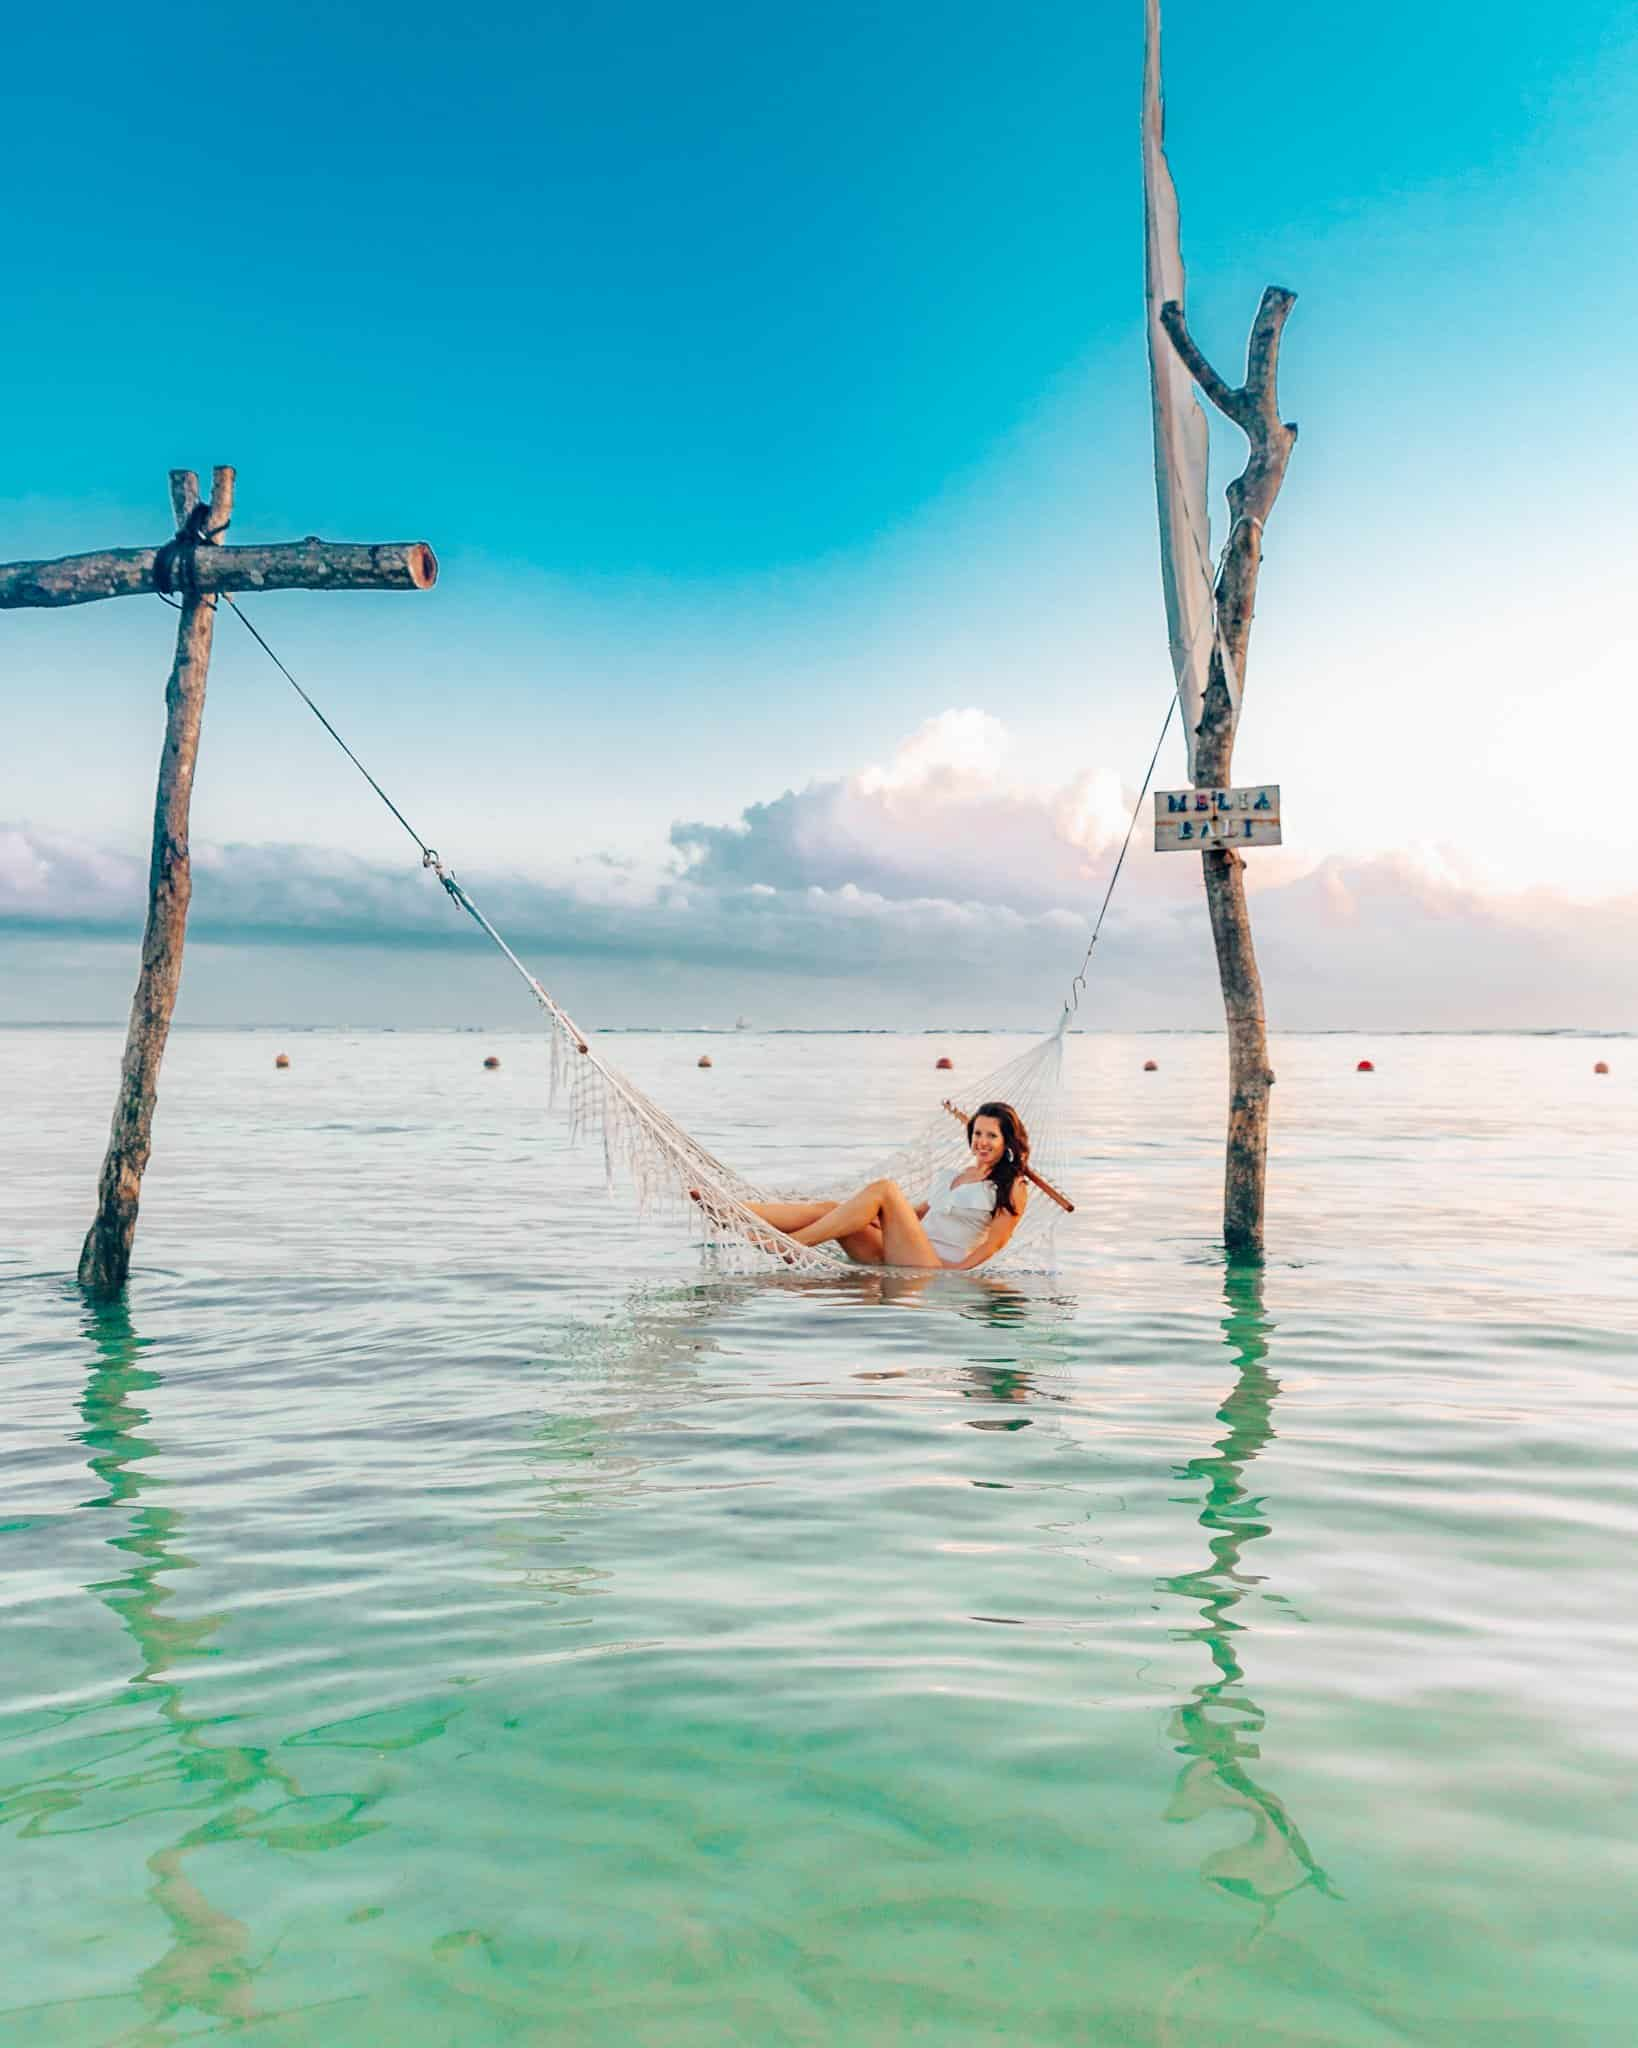 Nusa Dua Beach Water Hammock in Bali - The Next Trip